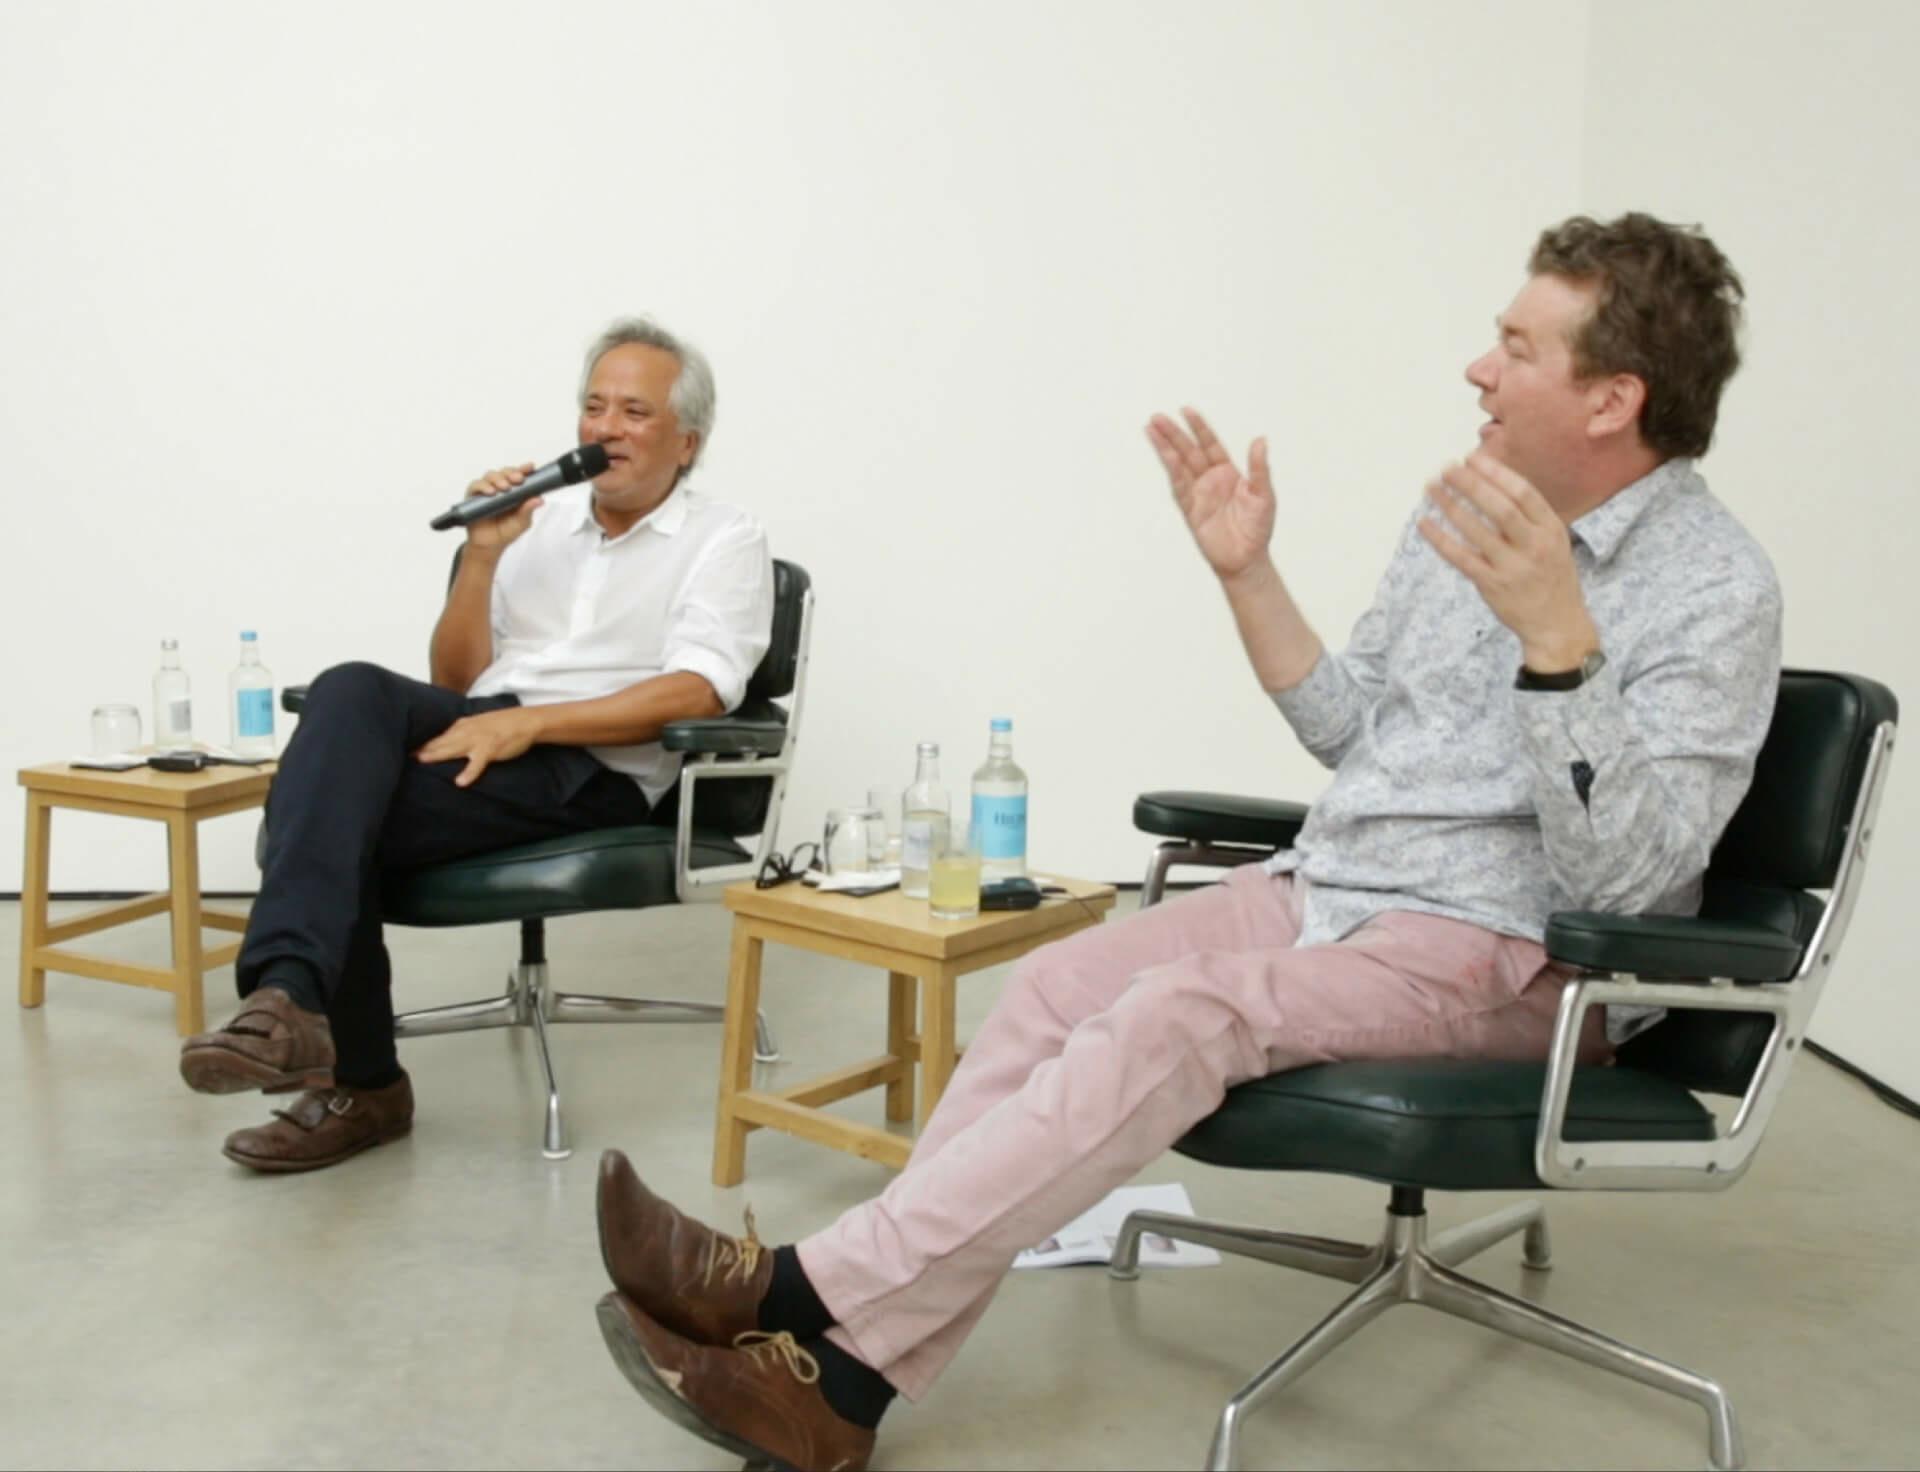 Anish Kapoor and Jonathan Jones